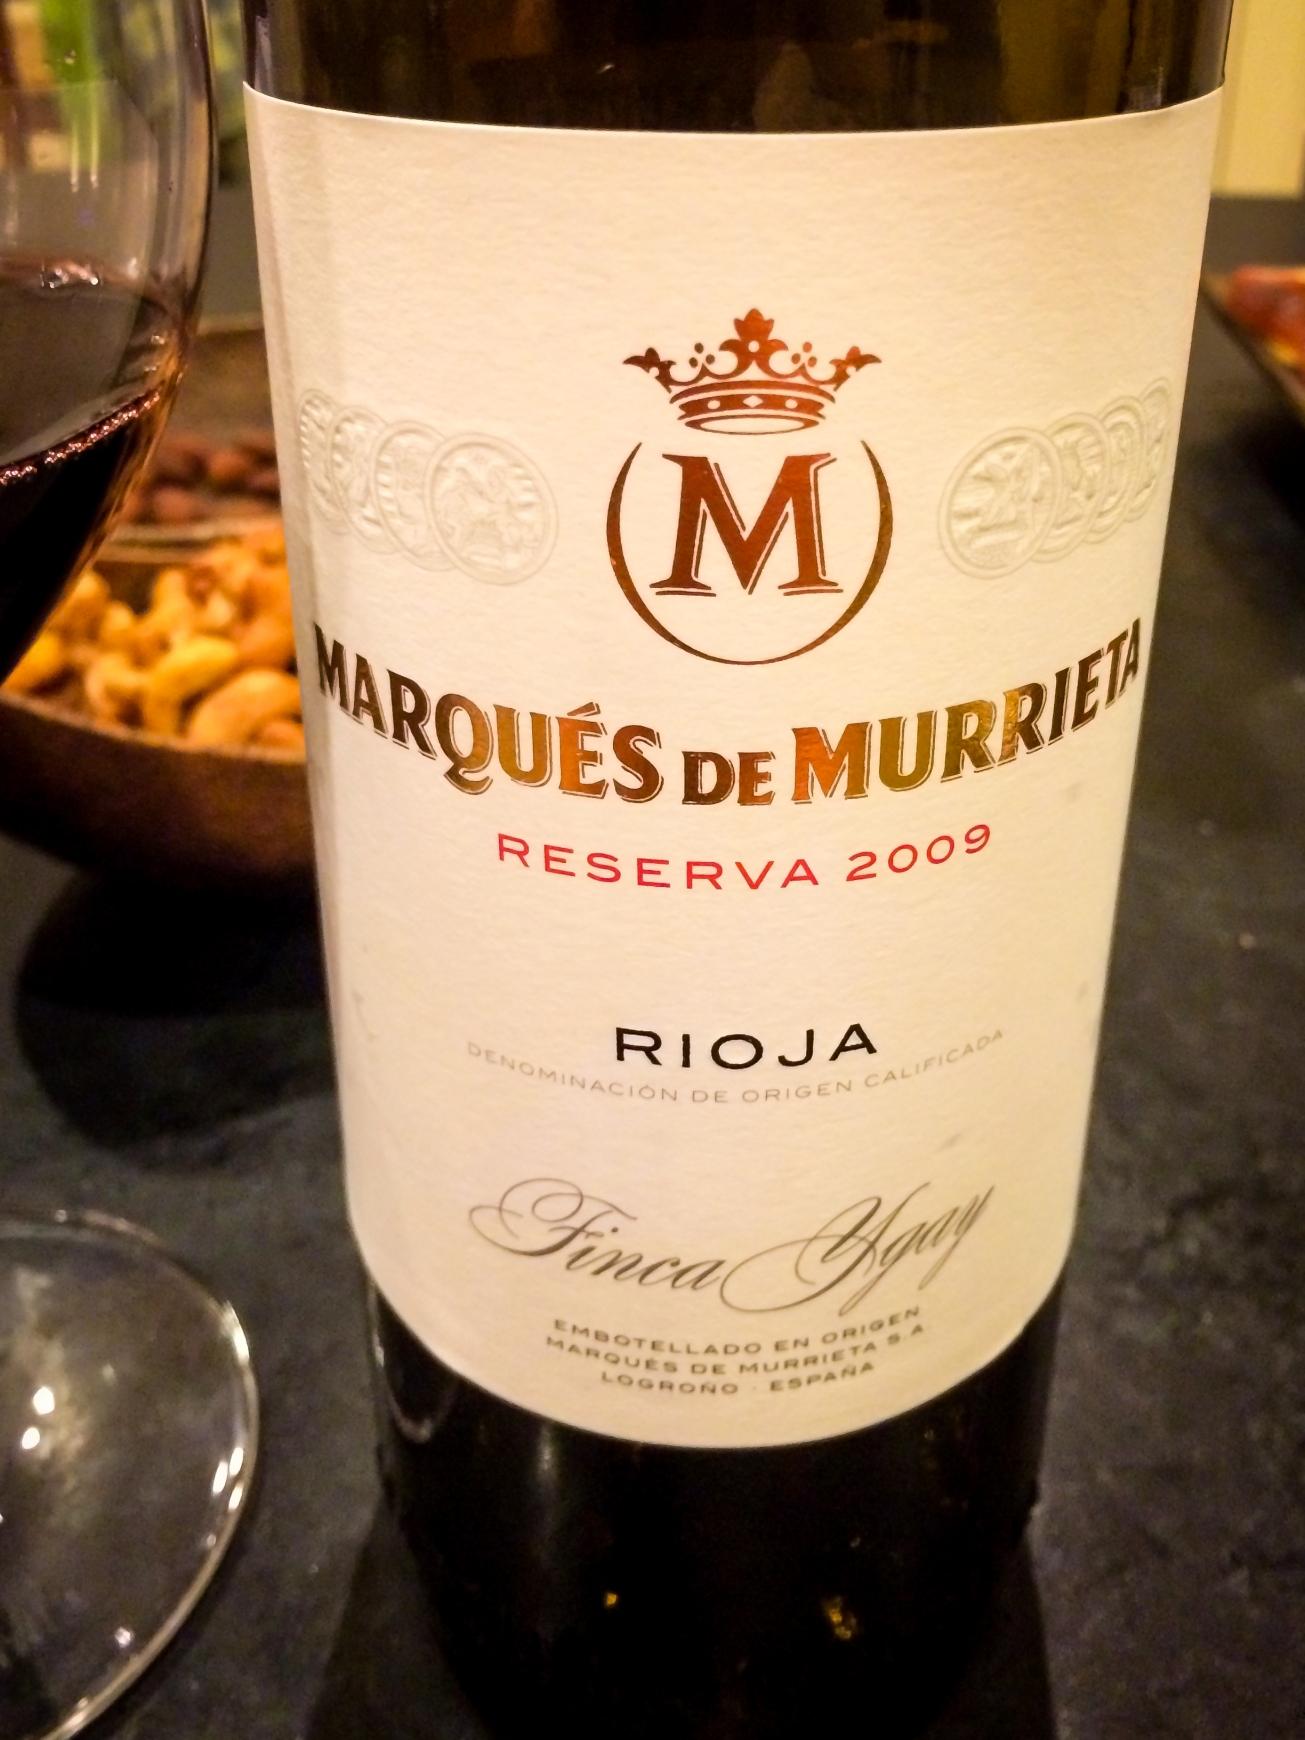 2009 Marqués de Murrieta Rioja Ygay Reserva